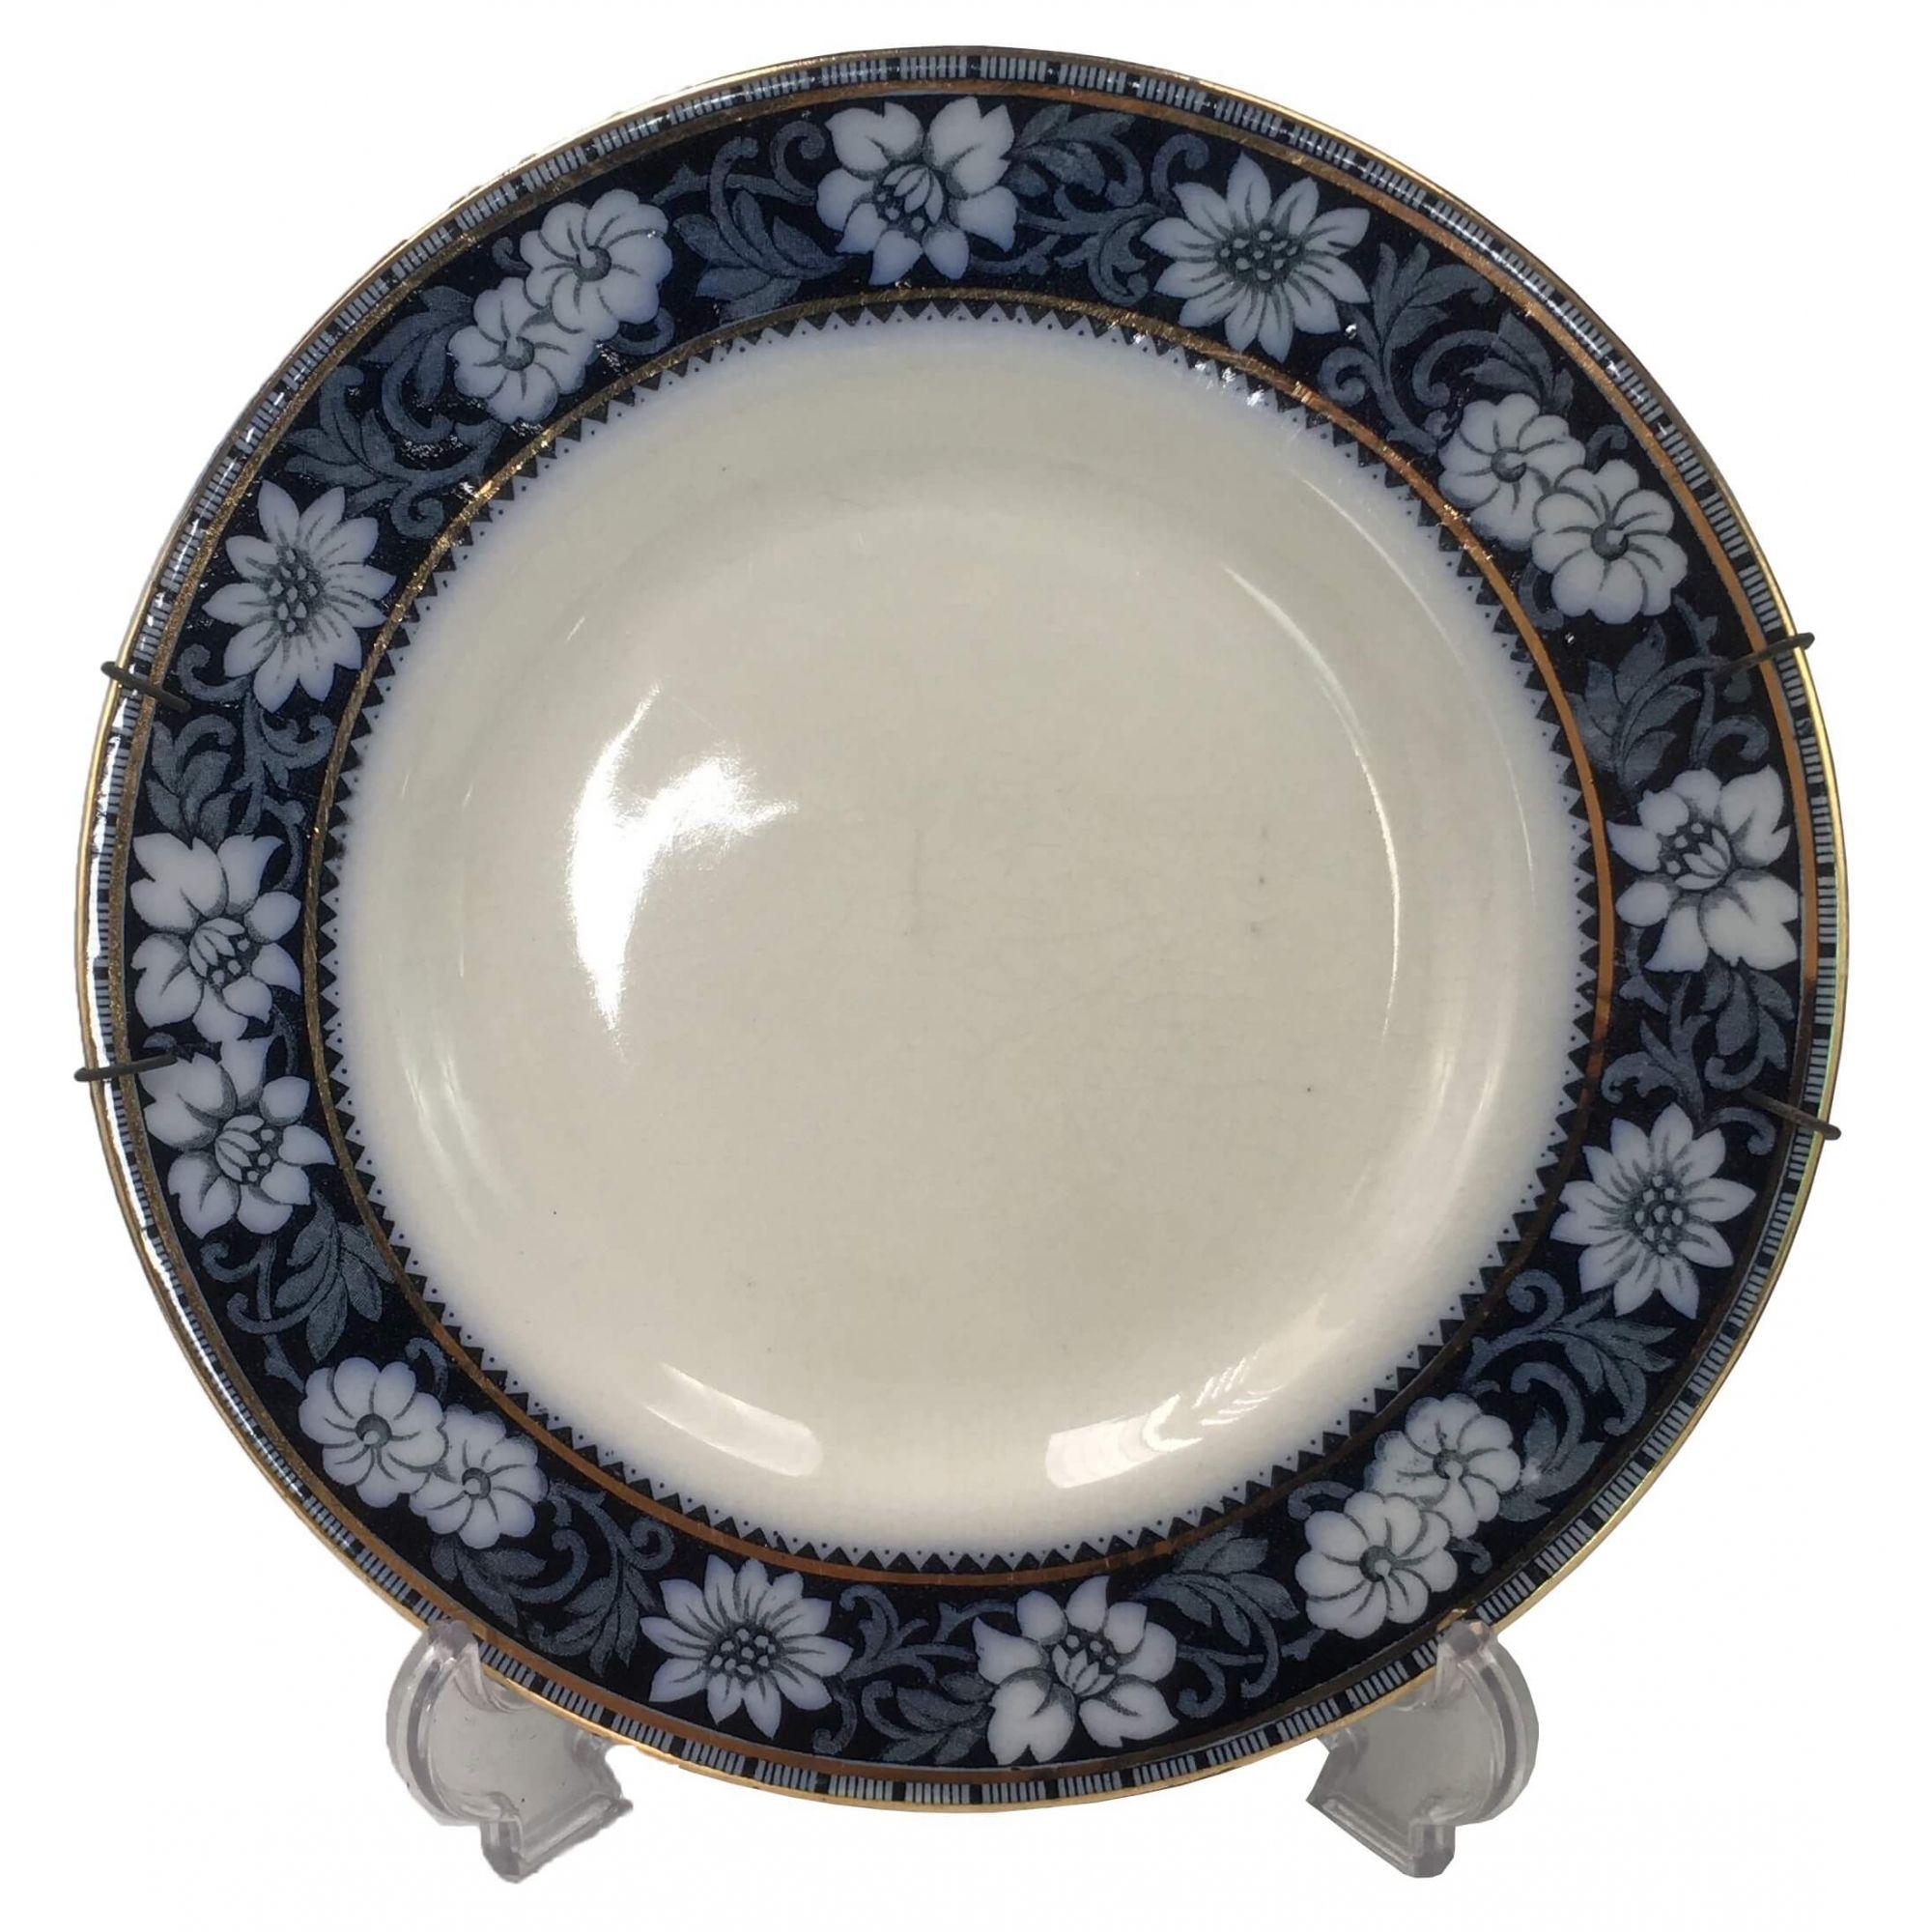 Prato Ingles Semi Borrao Porcelana Antiga Wood & Sons